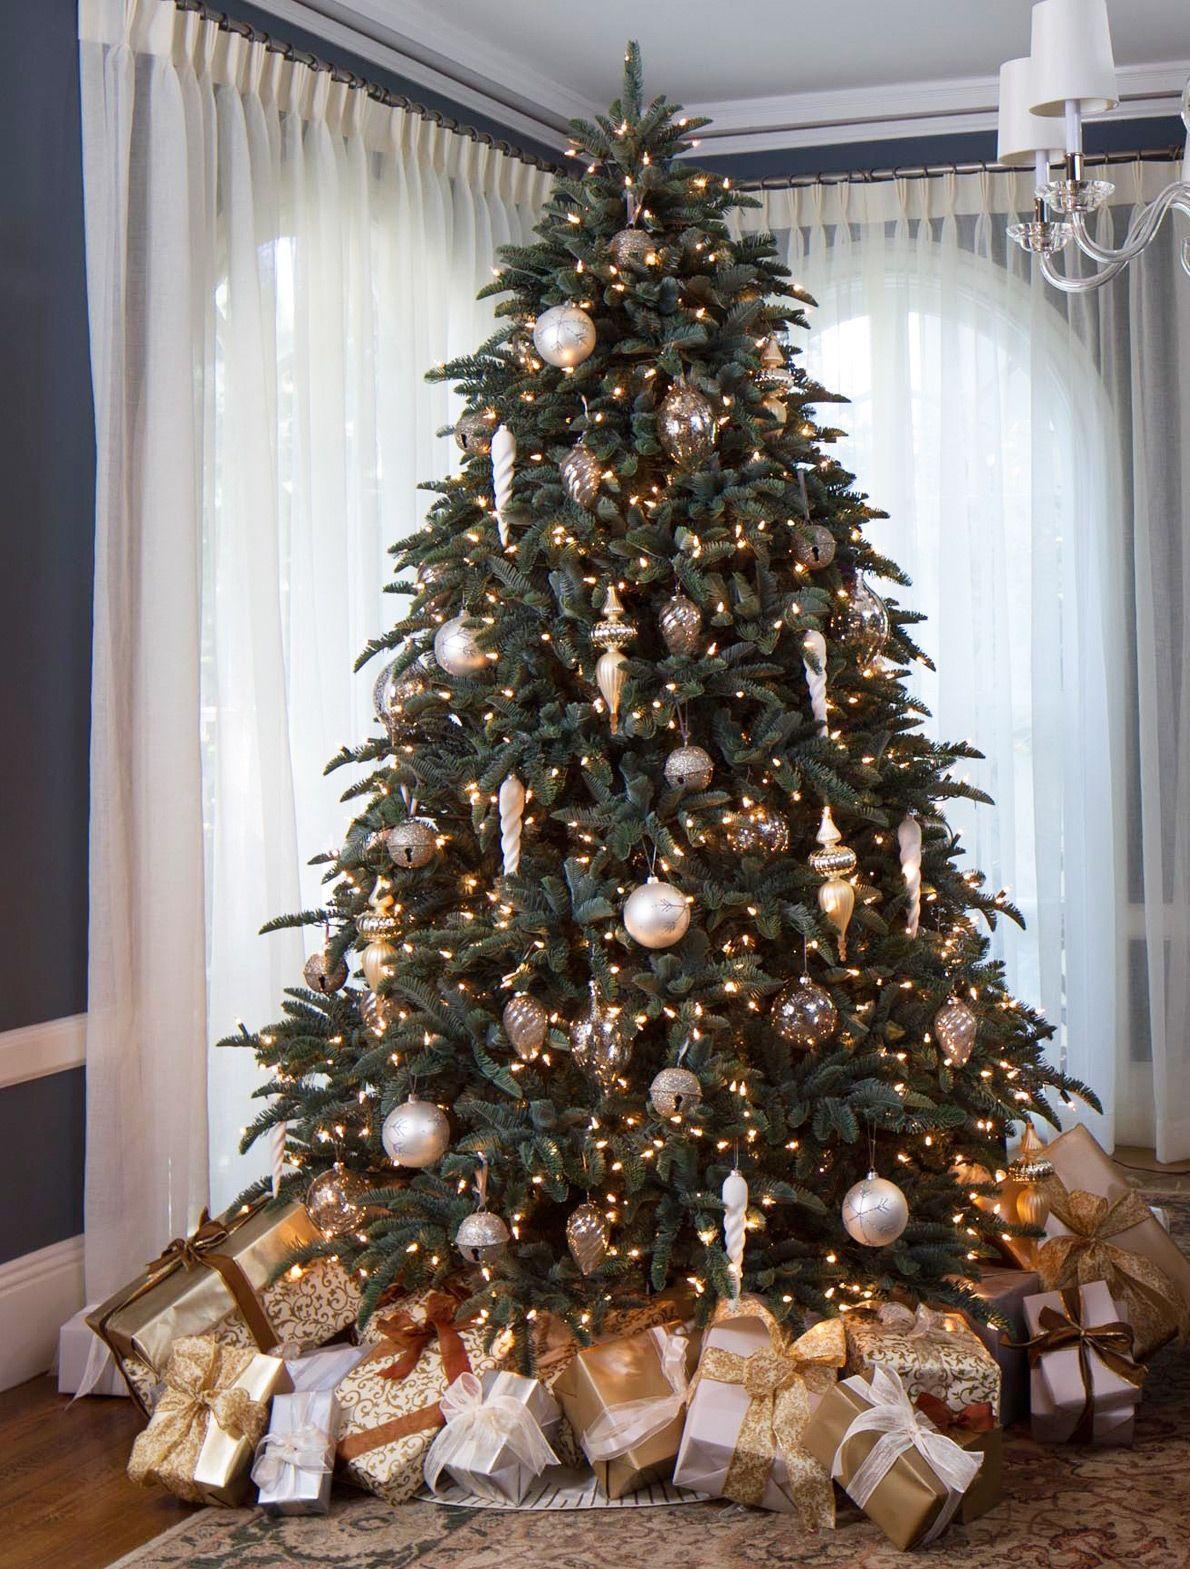 Balsam Fir Christmas Tree Decorated